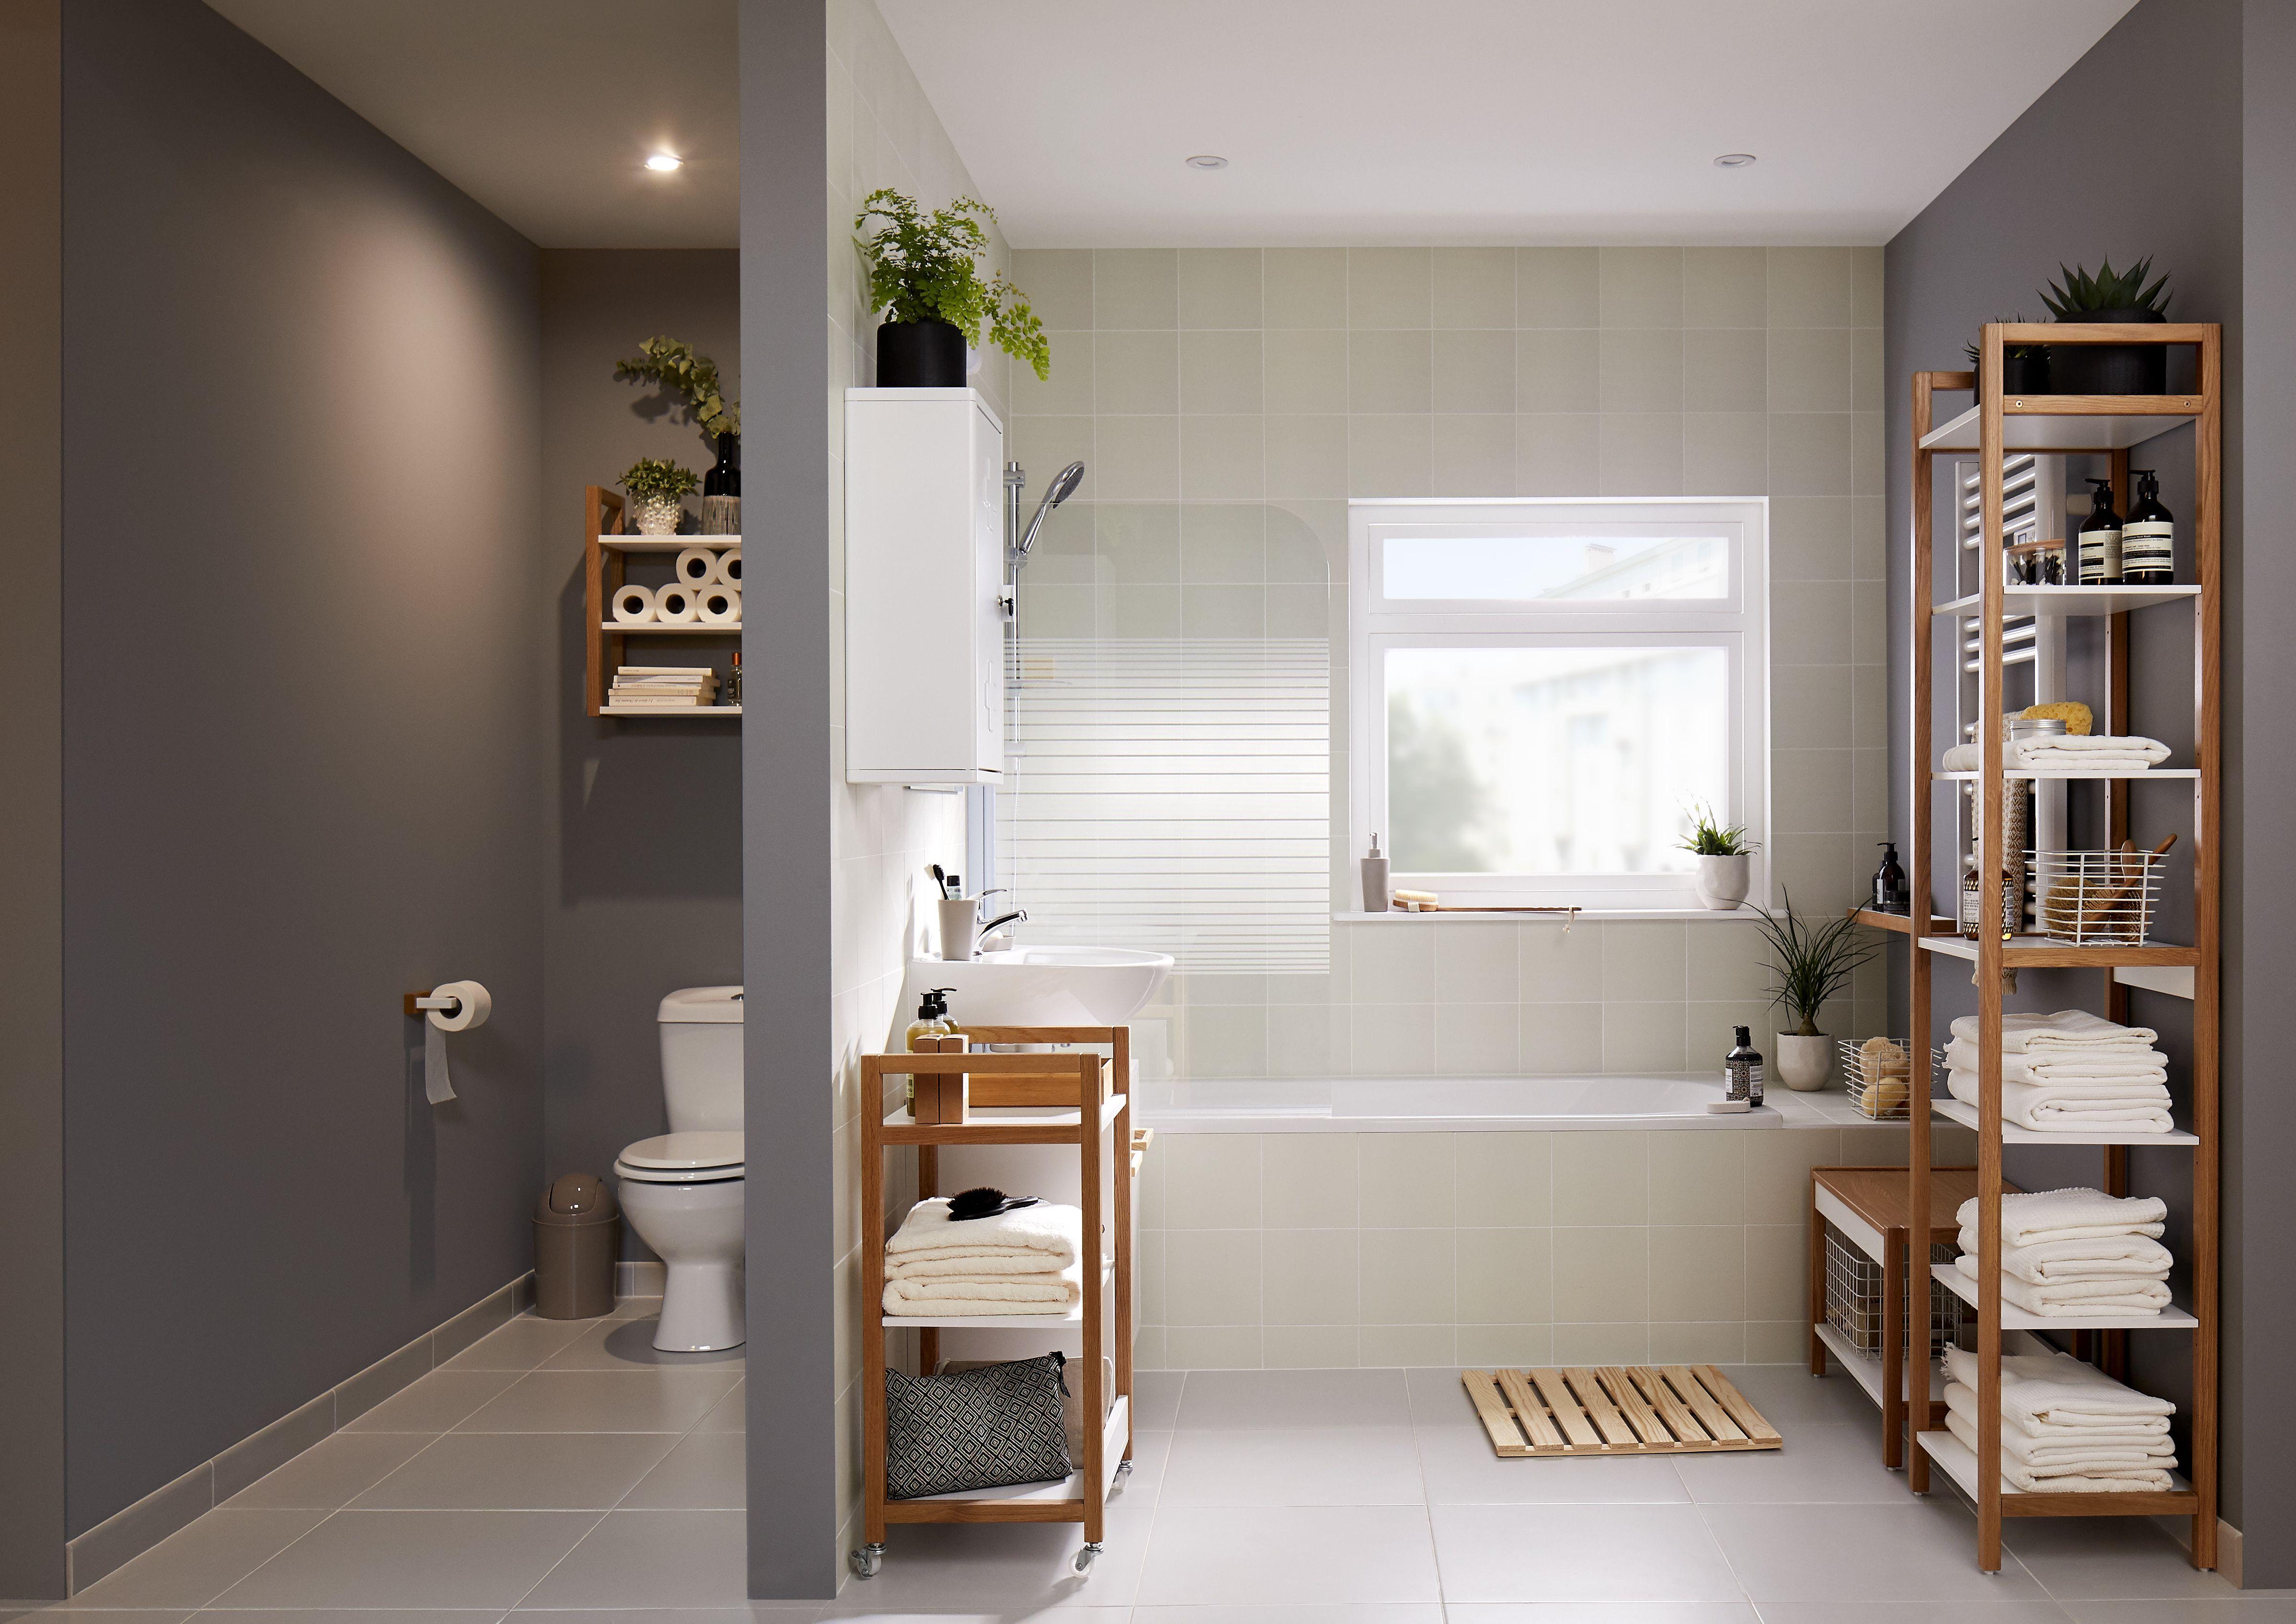 Artificial Grass Balcony Ideas, Small Bathroom Ideas Ideas Advice Diy At B Q